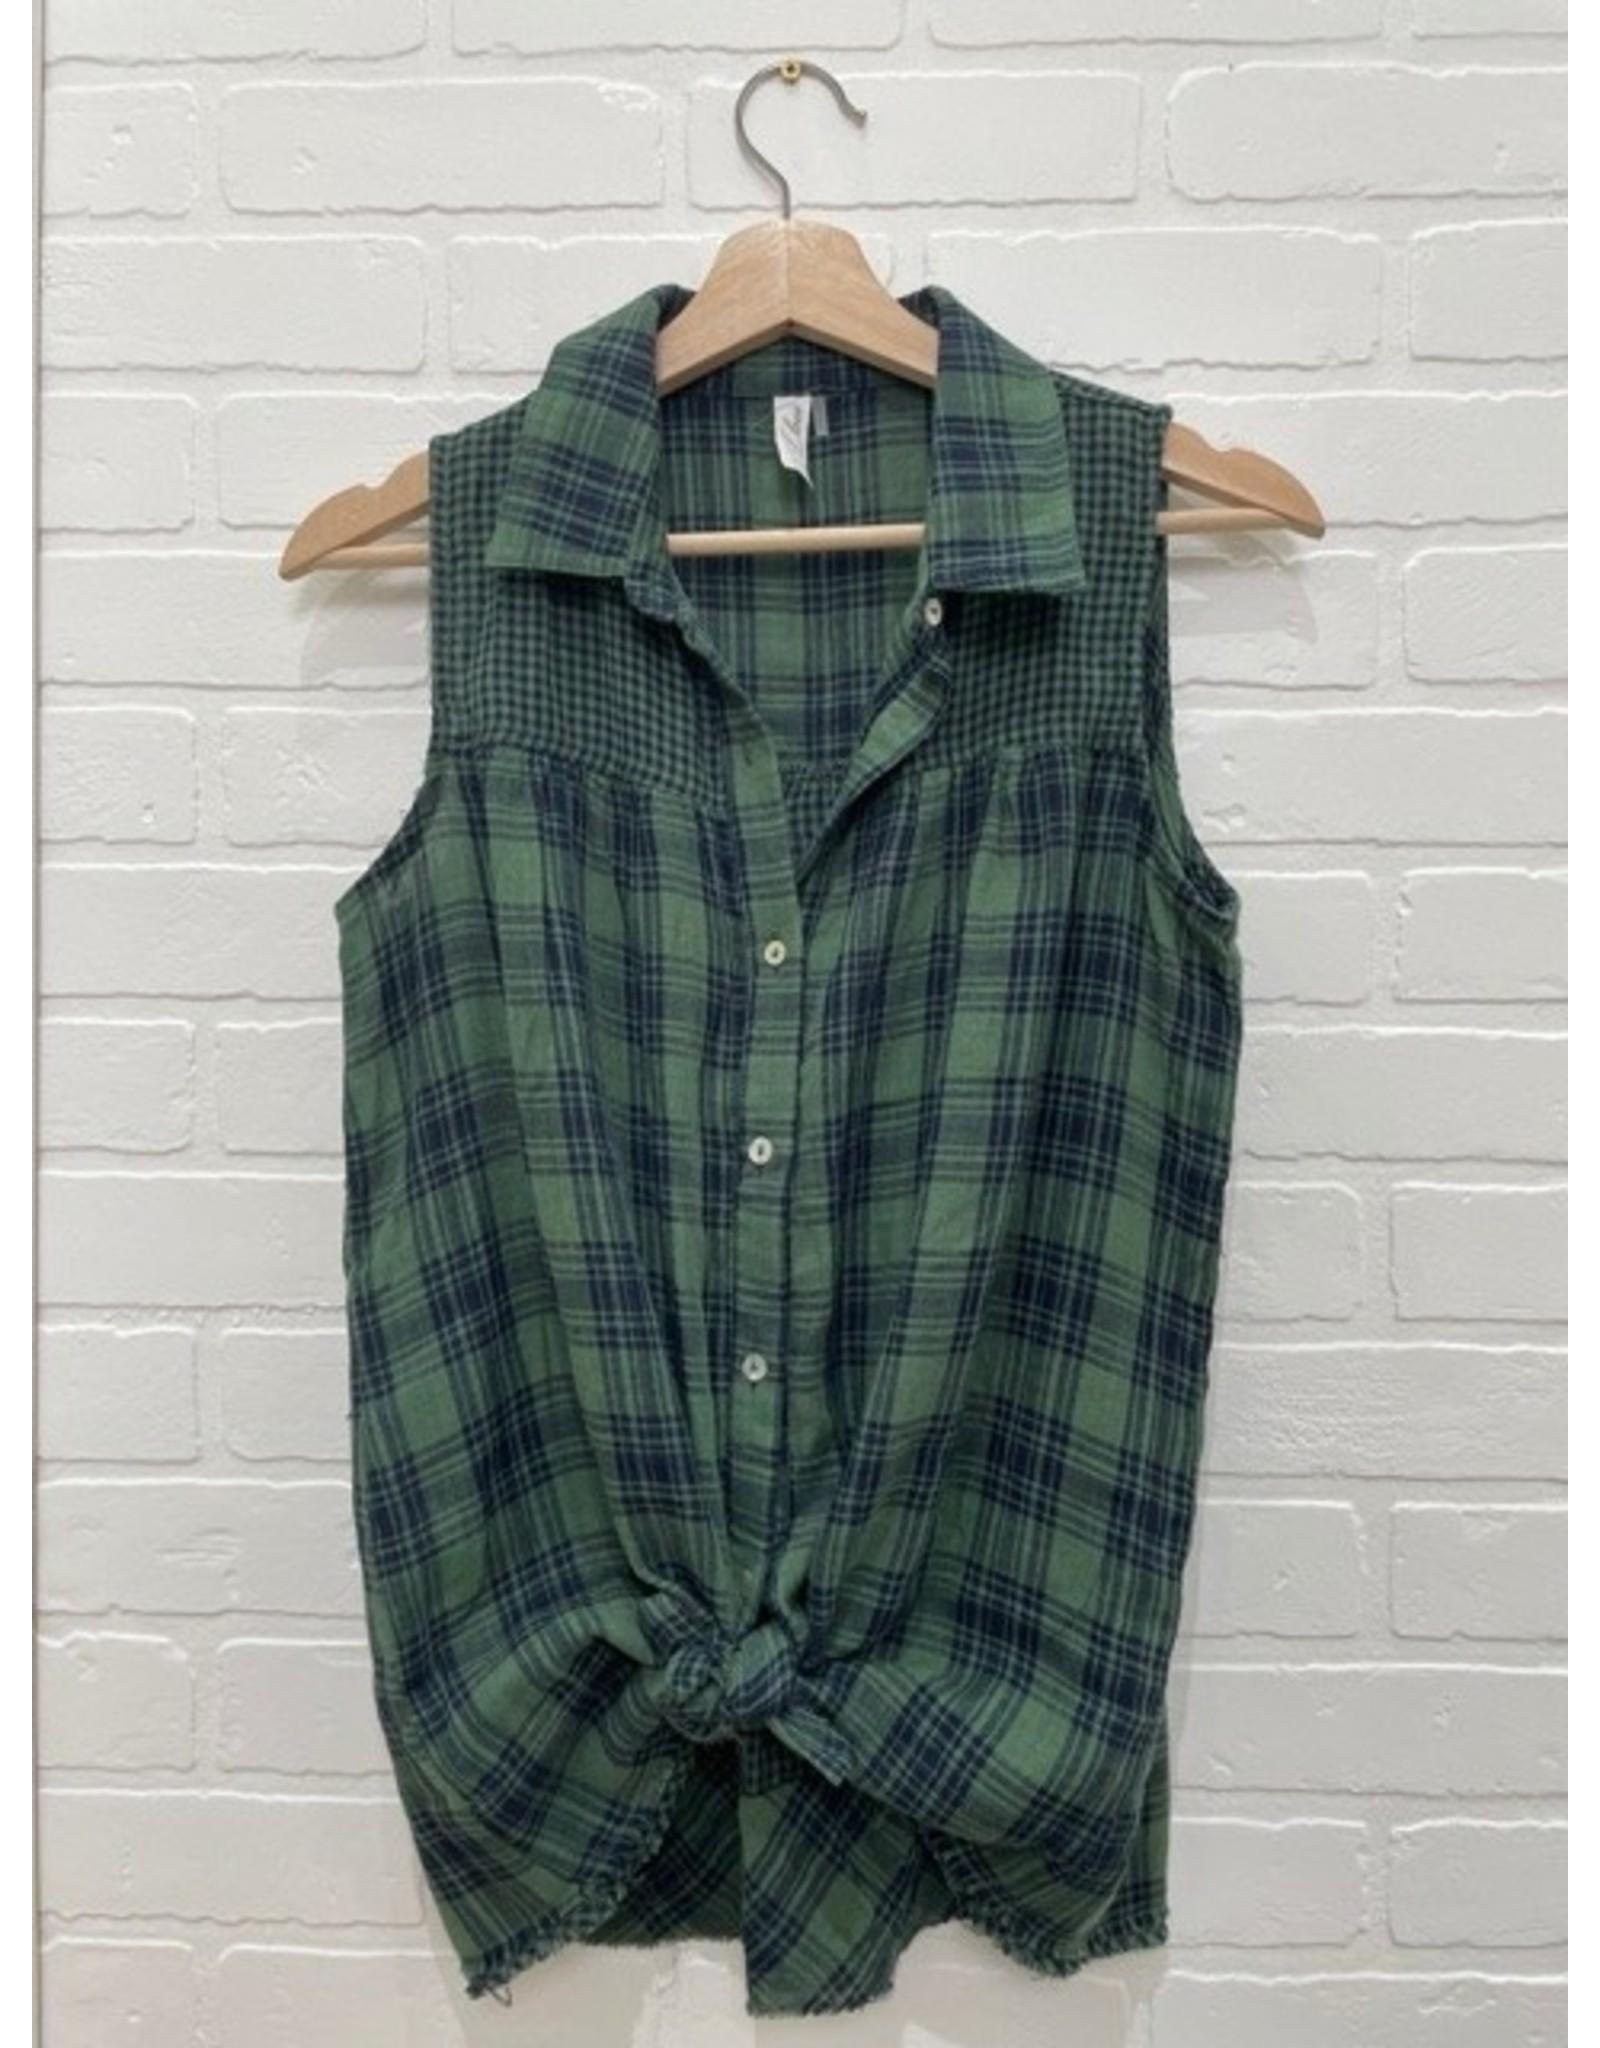 Arden - plaid sleeveless button down shirt (2 colours)